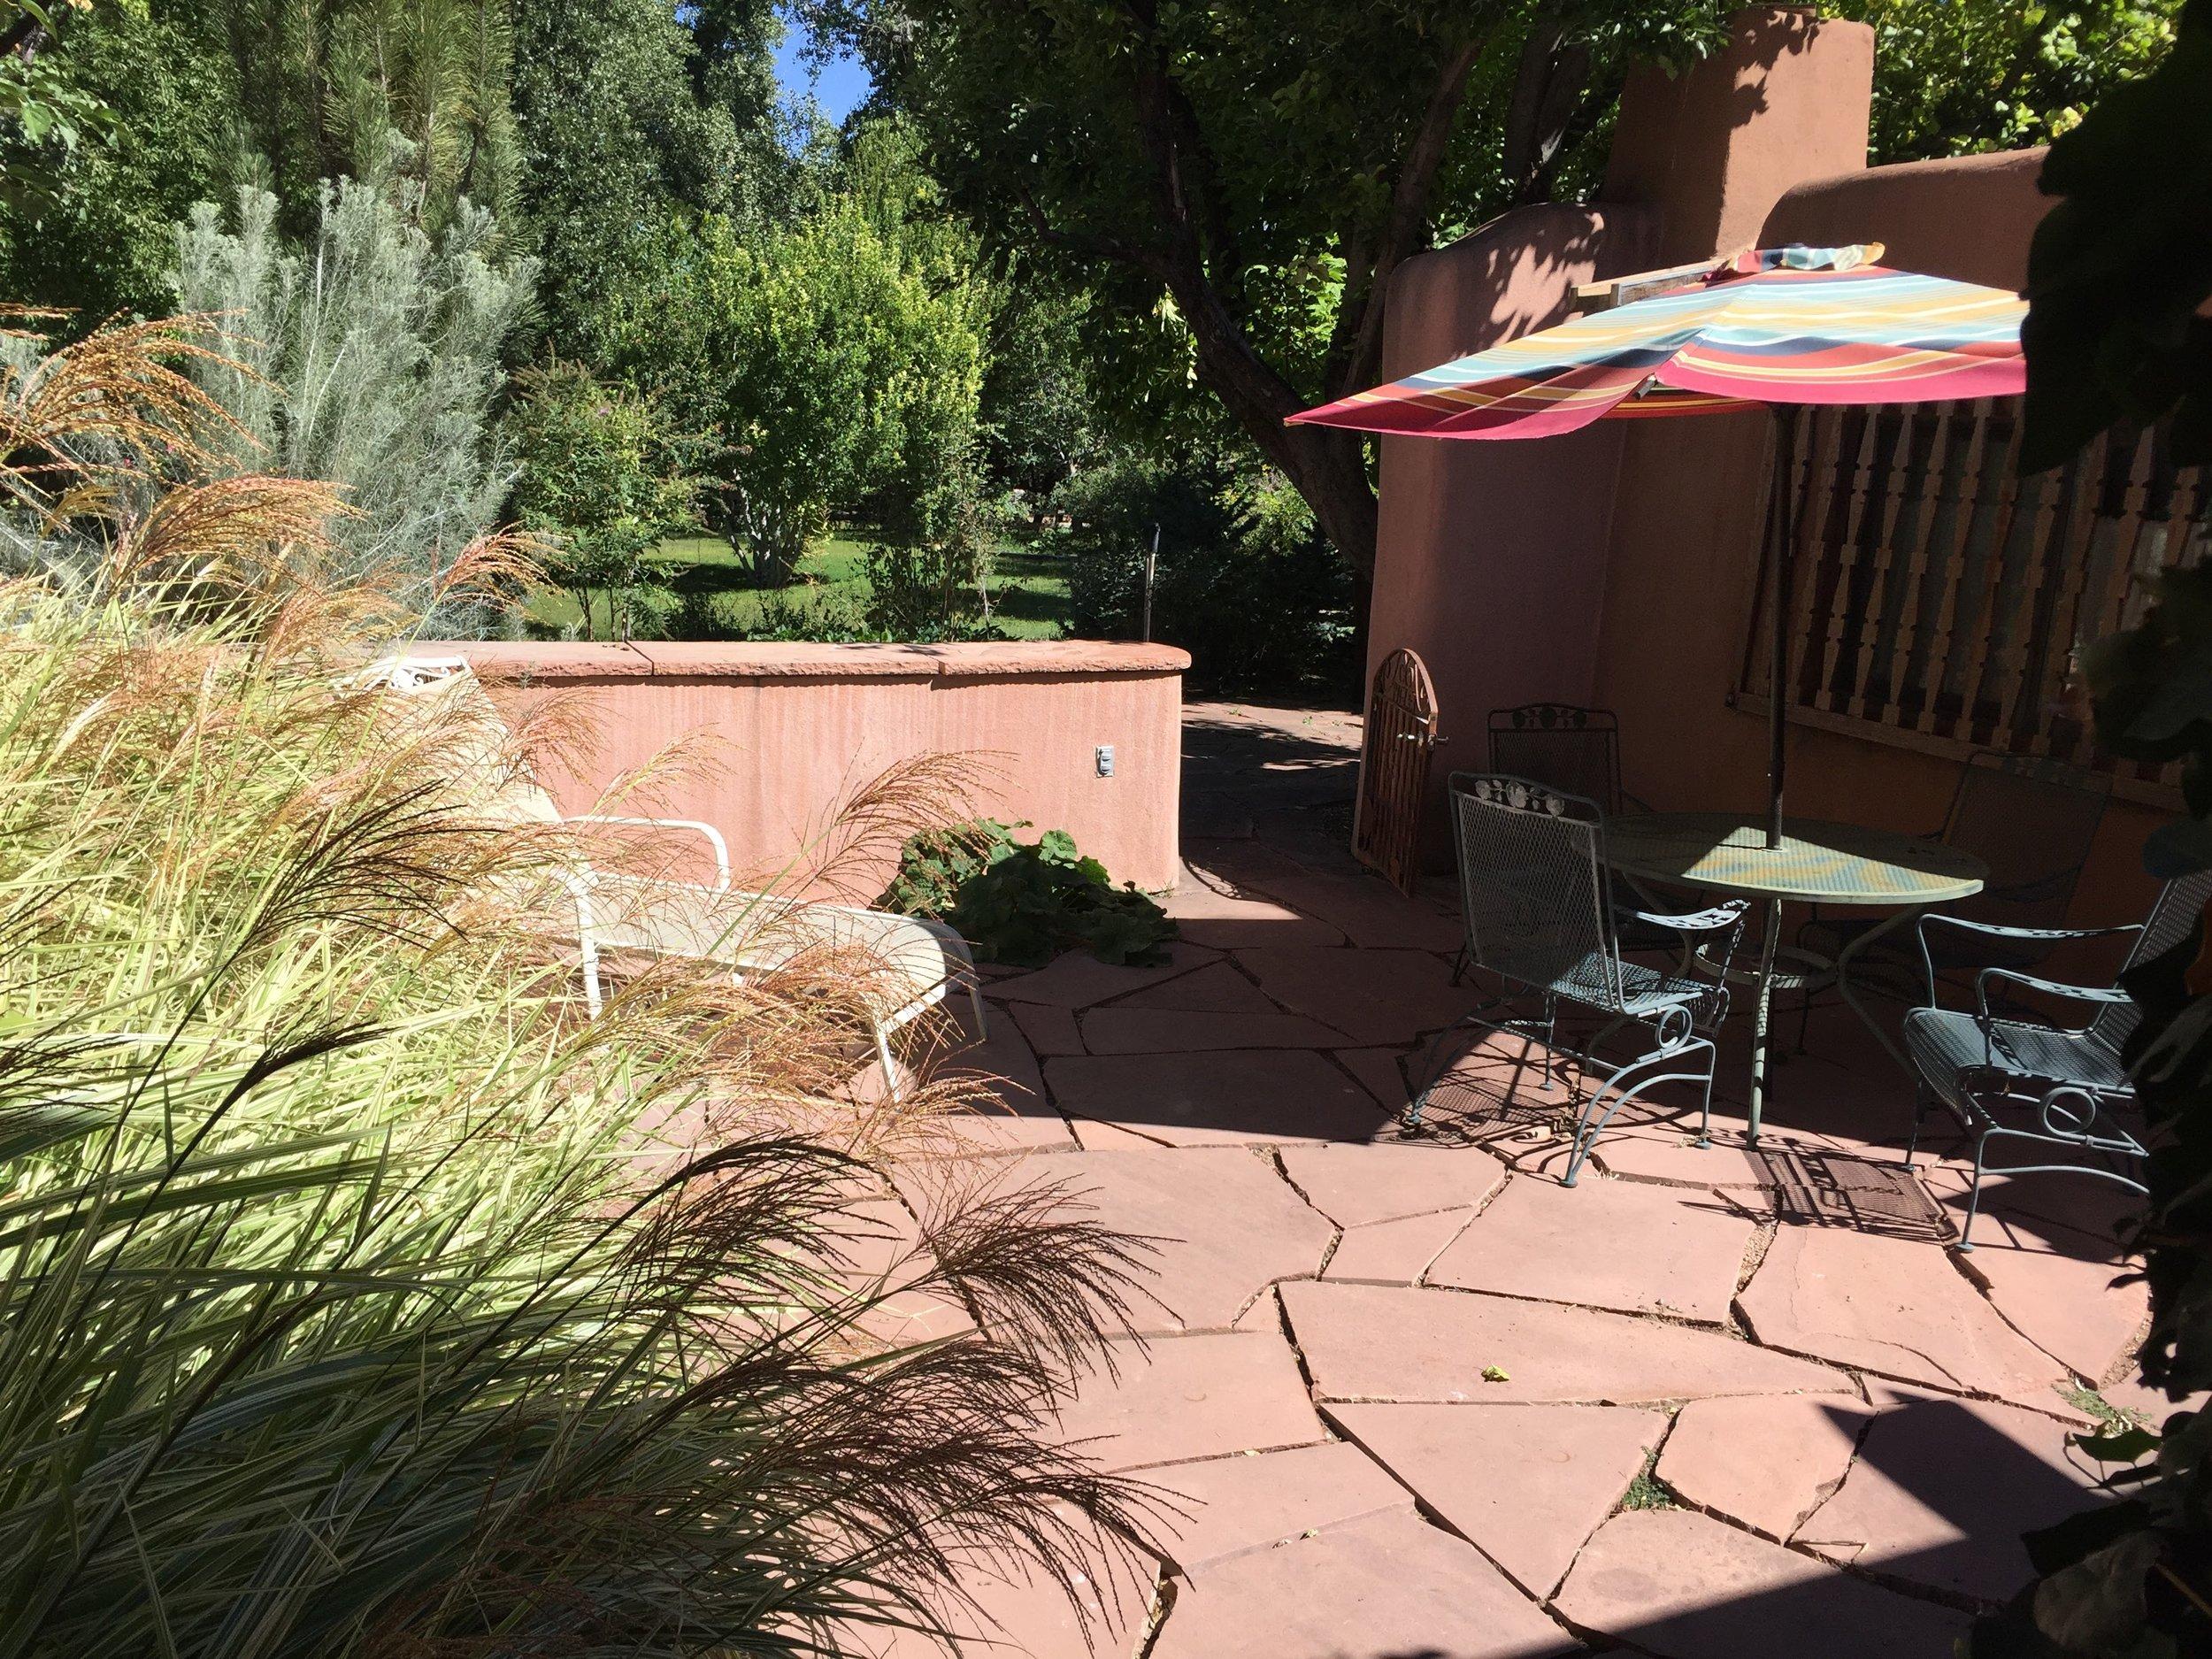 Outdoor Living Abounds In Piglet